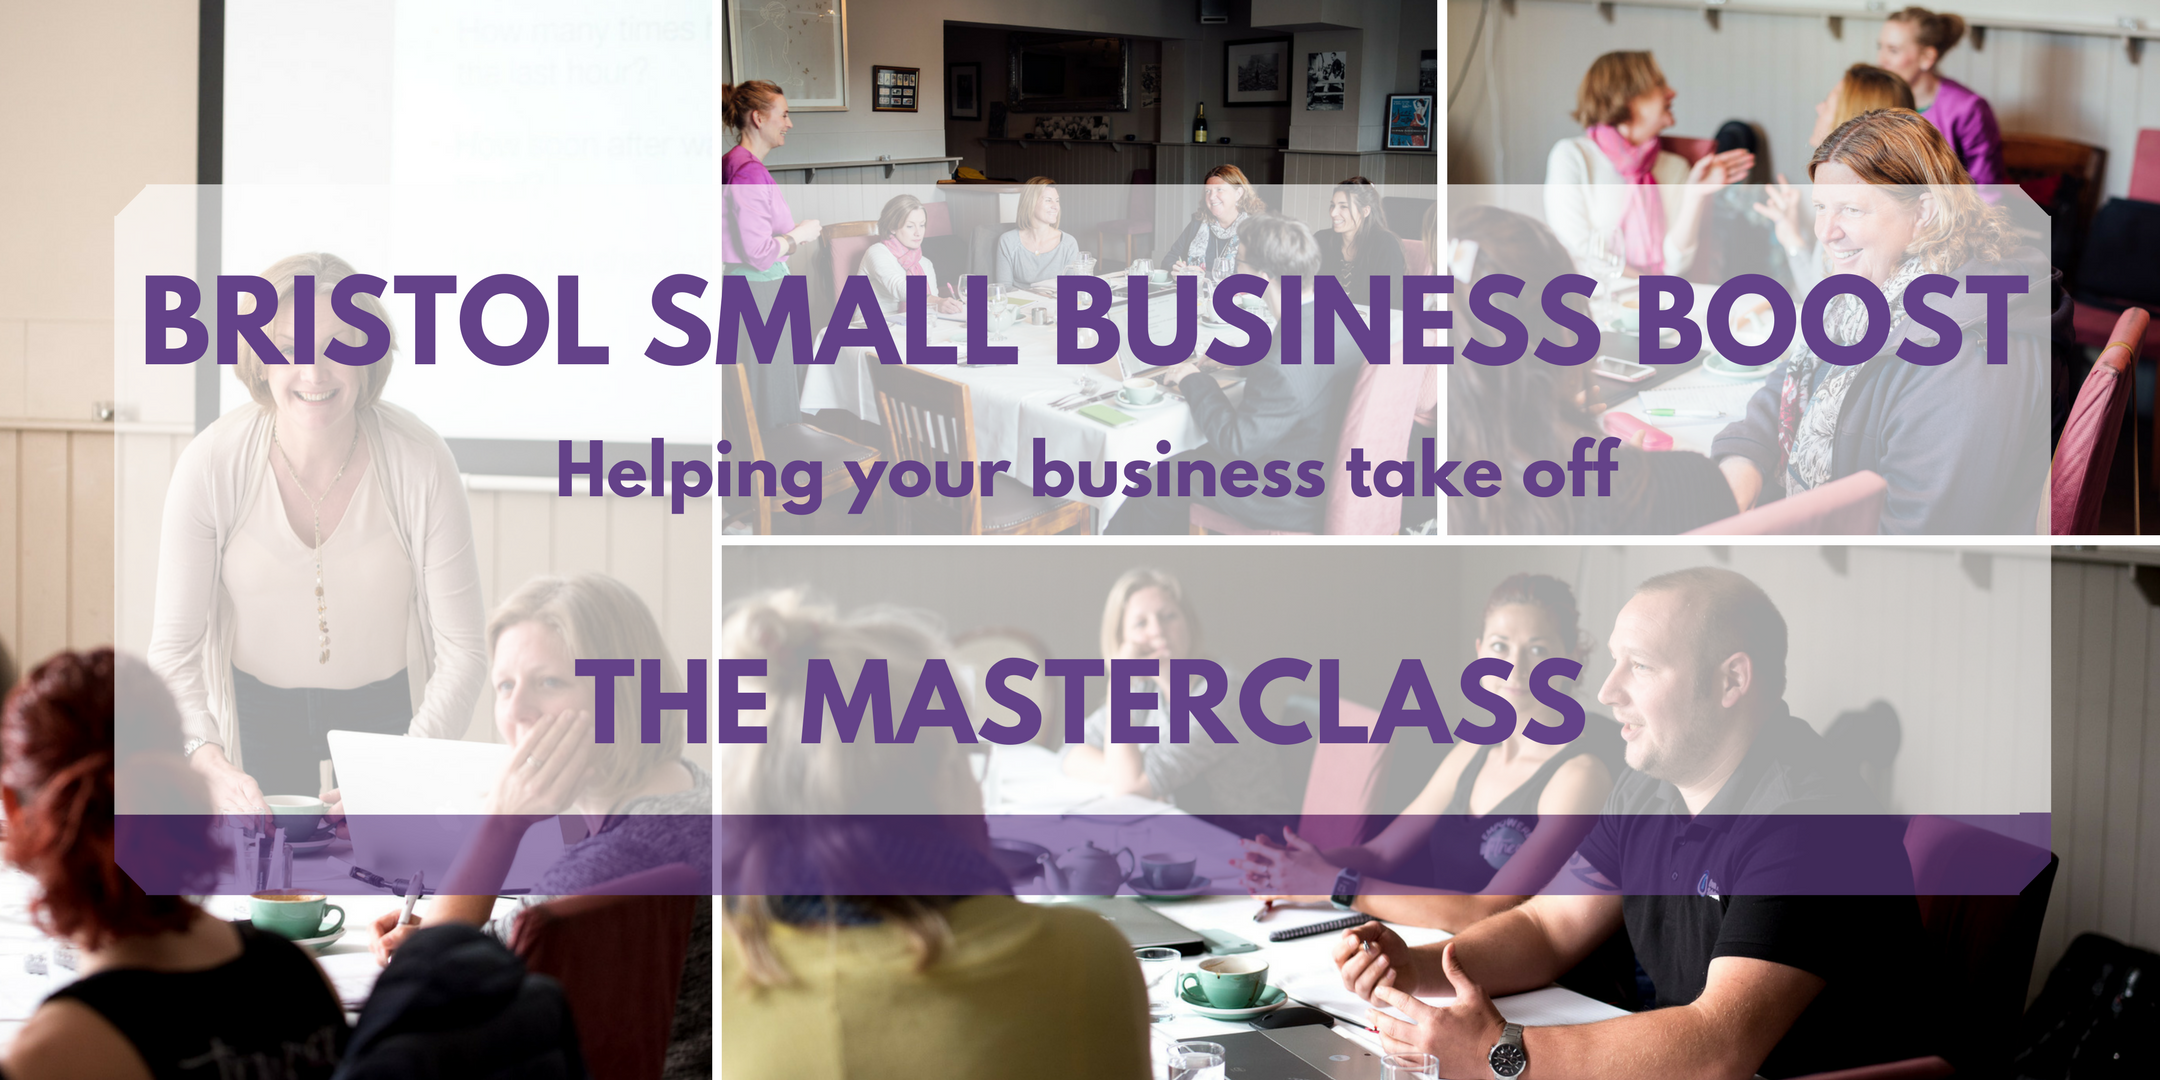 BSBB Masterclass - Energy, Focus & Recharge: